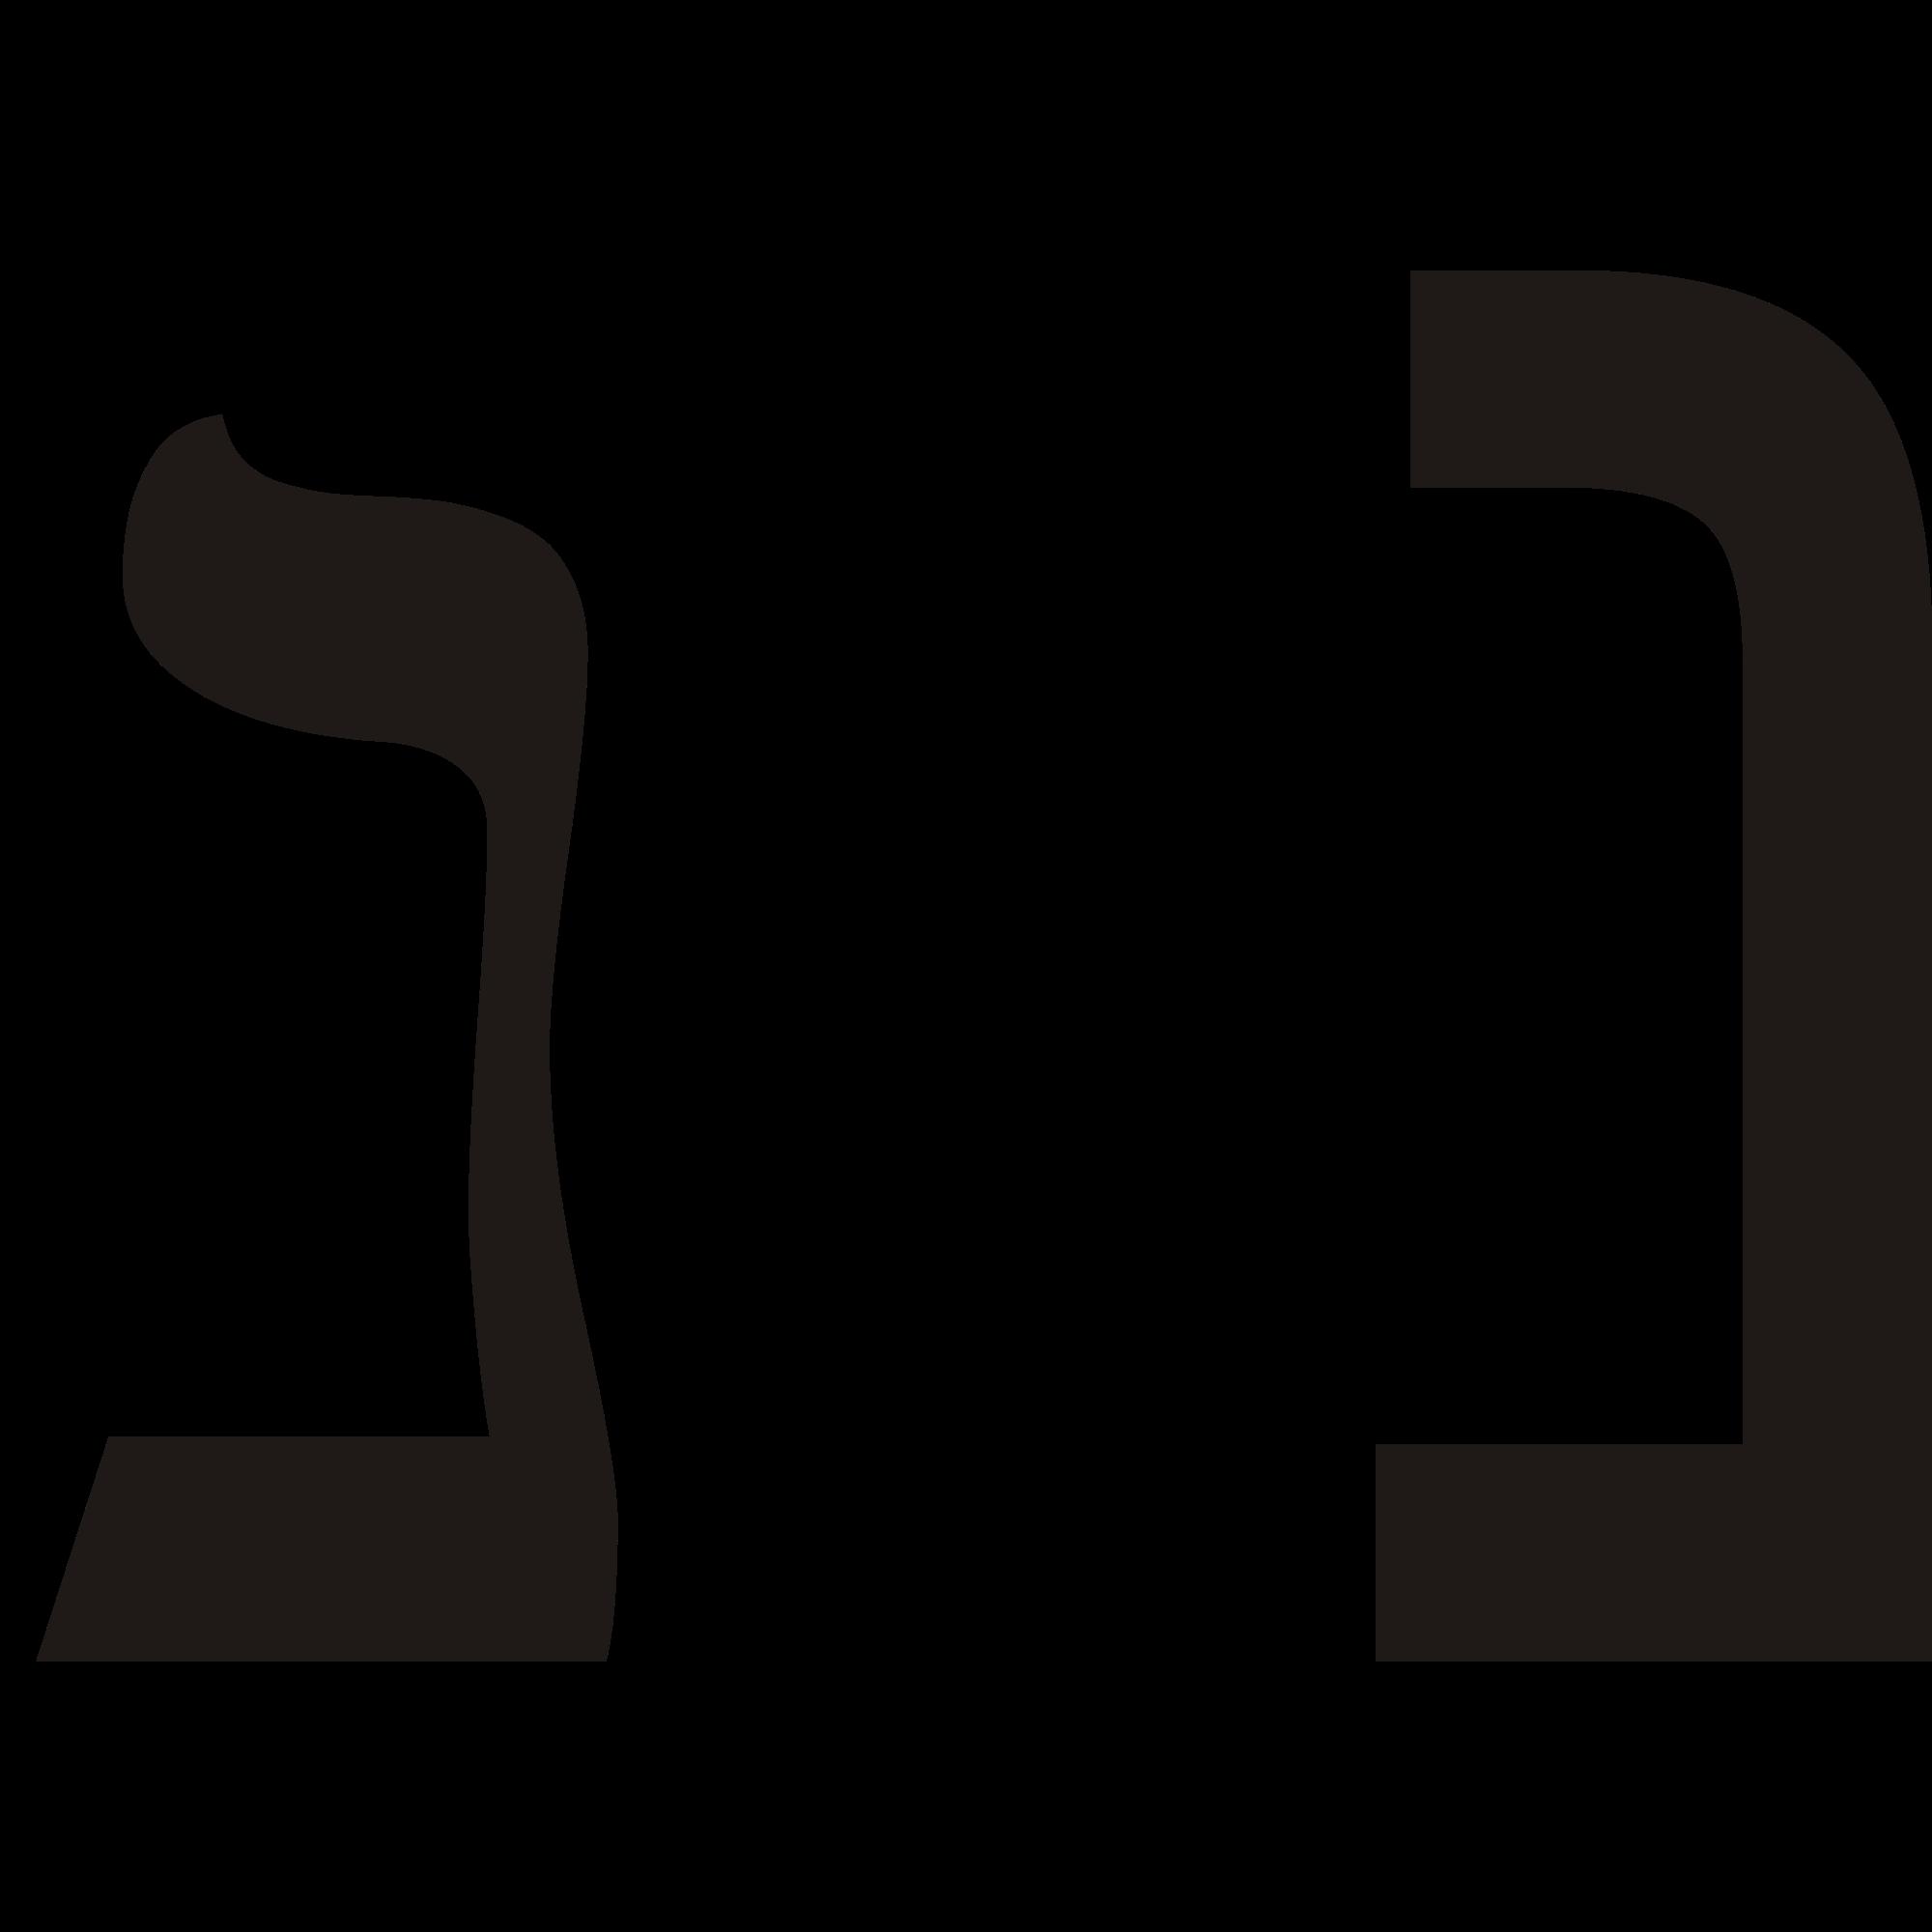 Dreidel clipart svg. File hebrew letter nun